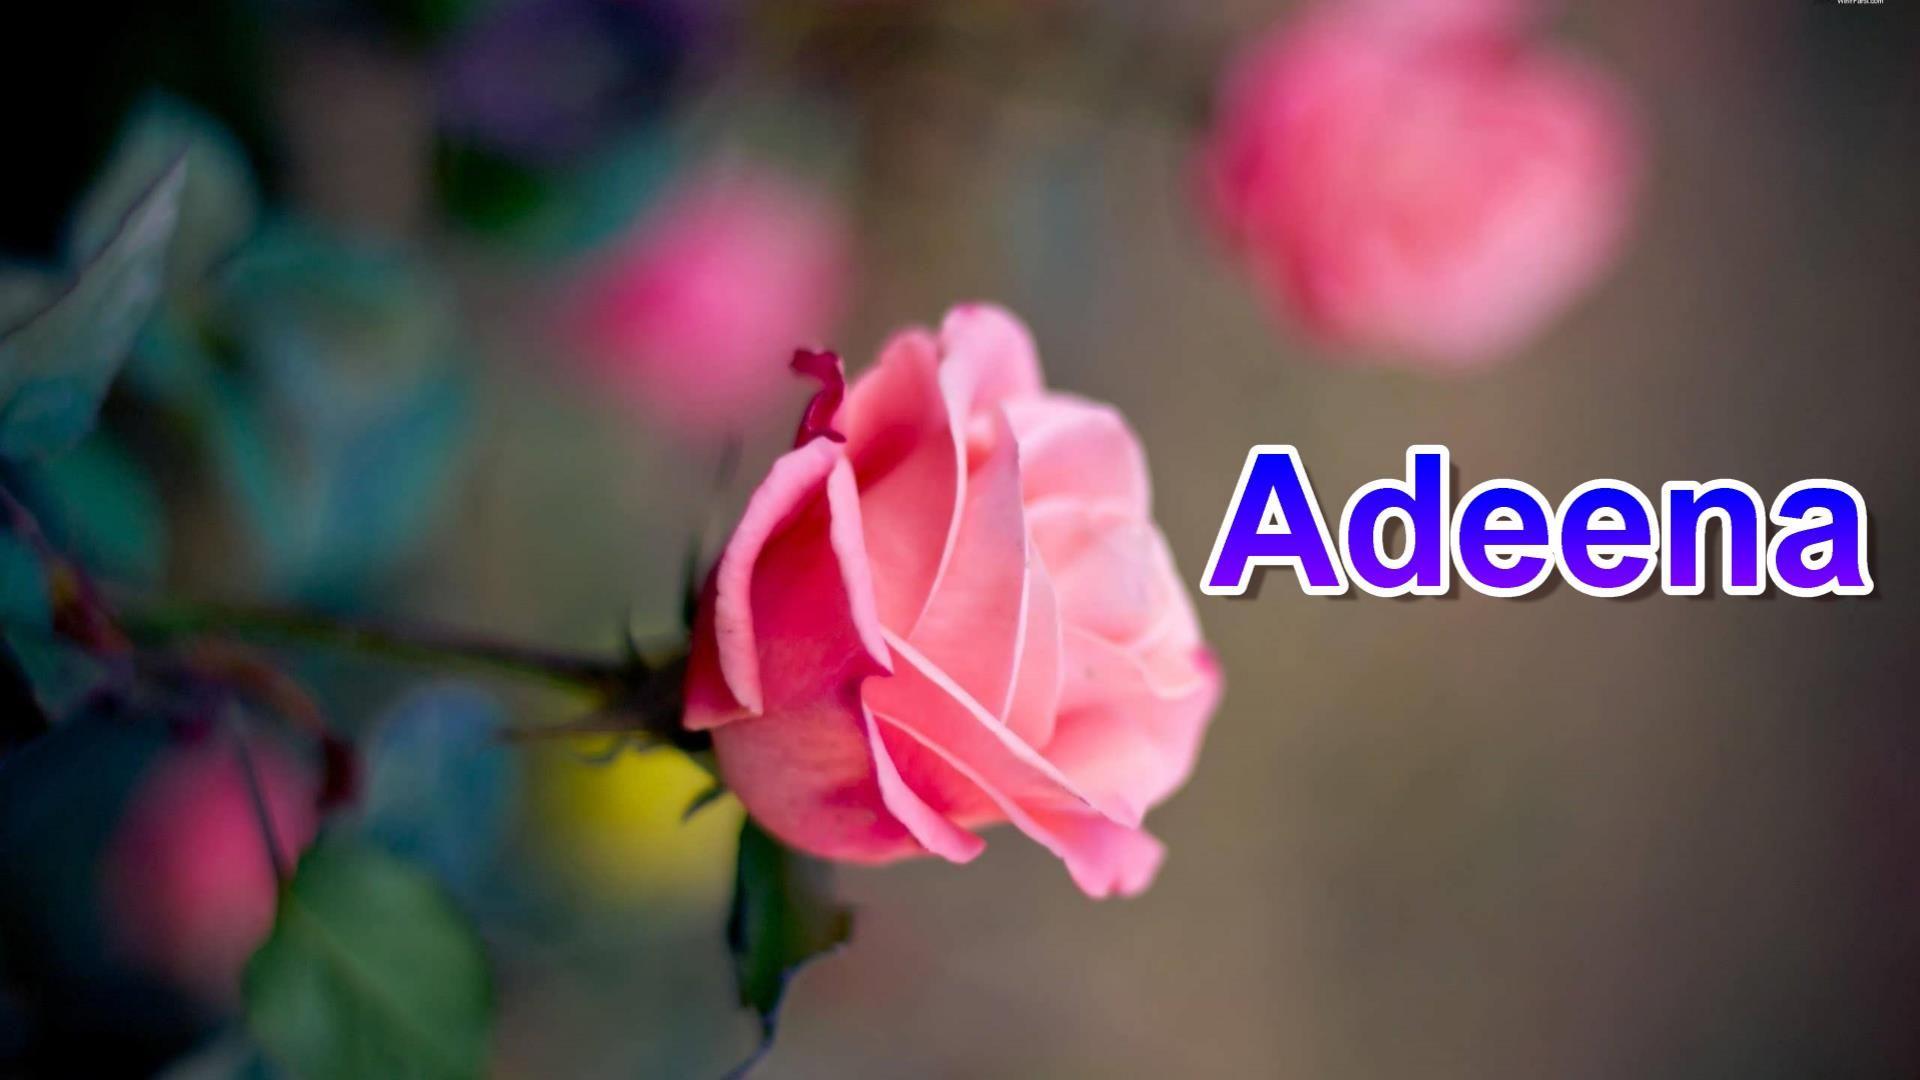 Adeena Name Whatsapp Status Video Status By Sani Production In 2020 Pink Rose Wallpaper Hd Pink Rose Flower Flowers